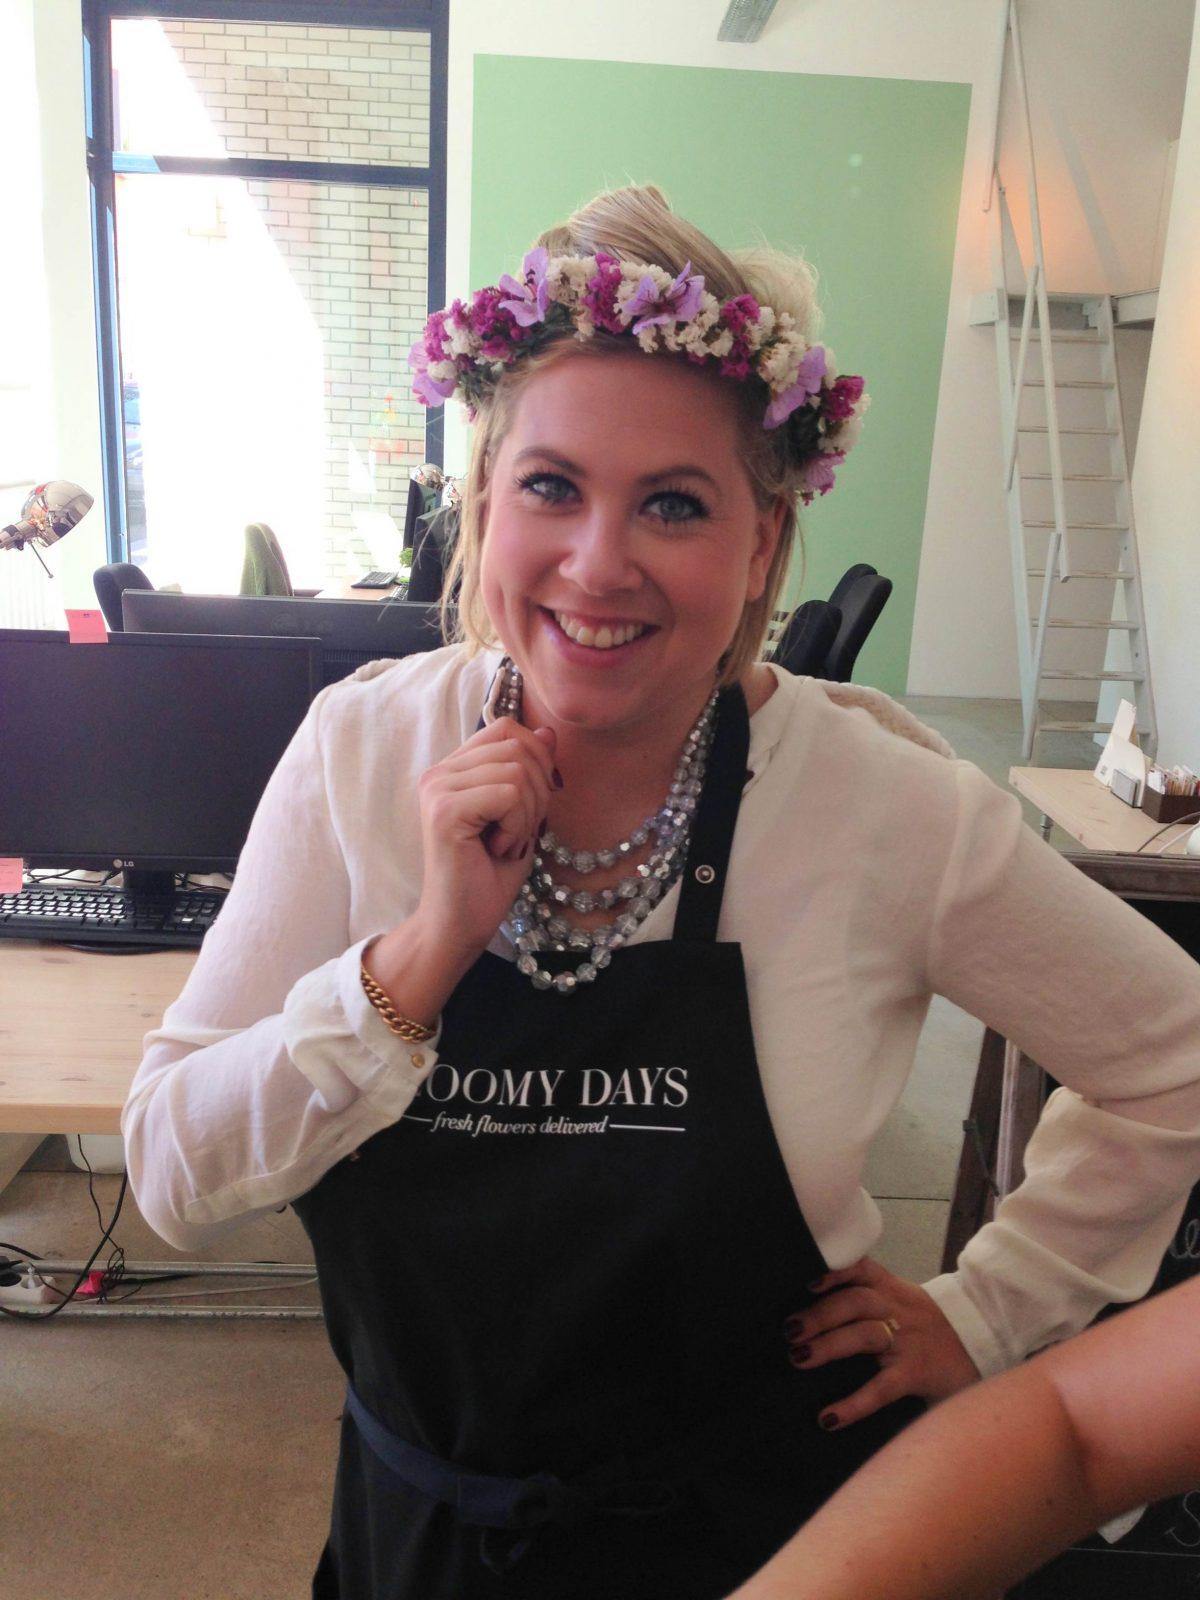 Franziska von Hardenberg, Bloomy Days Gründerin Berlin